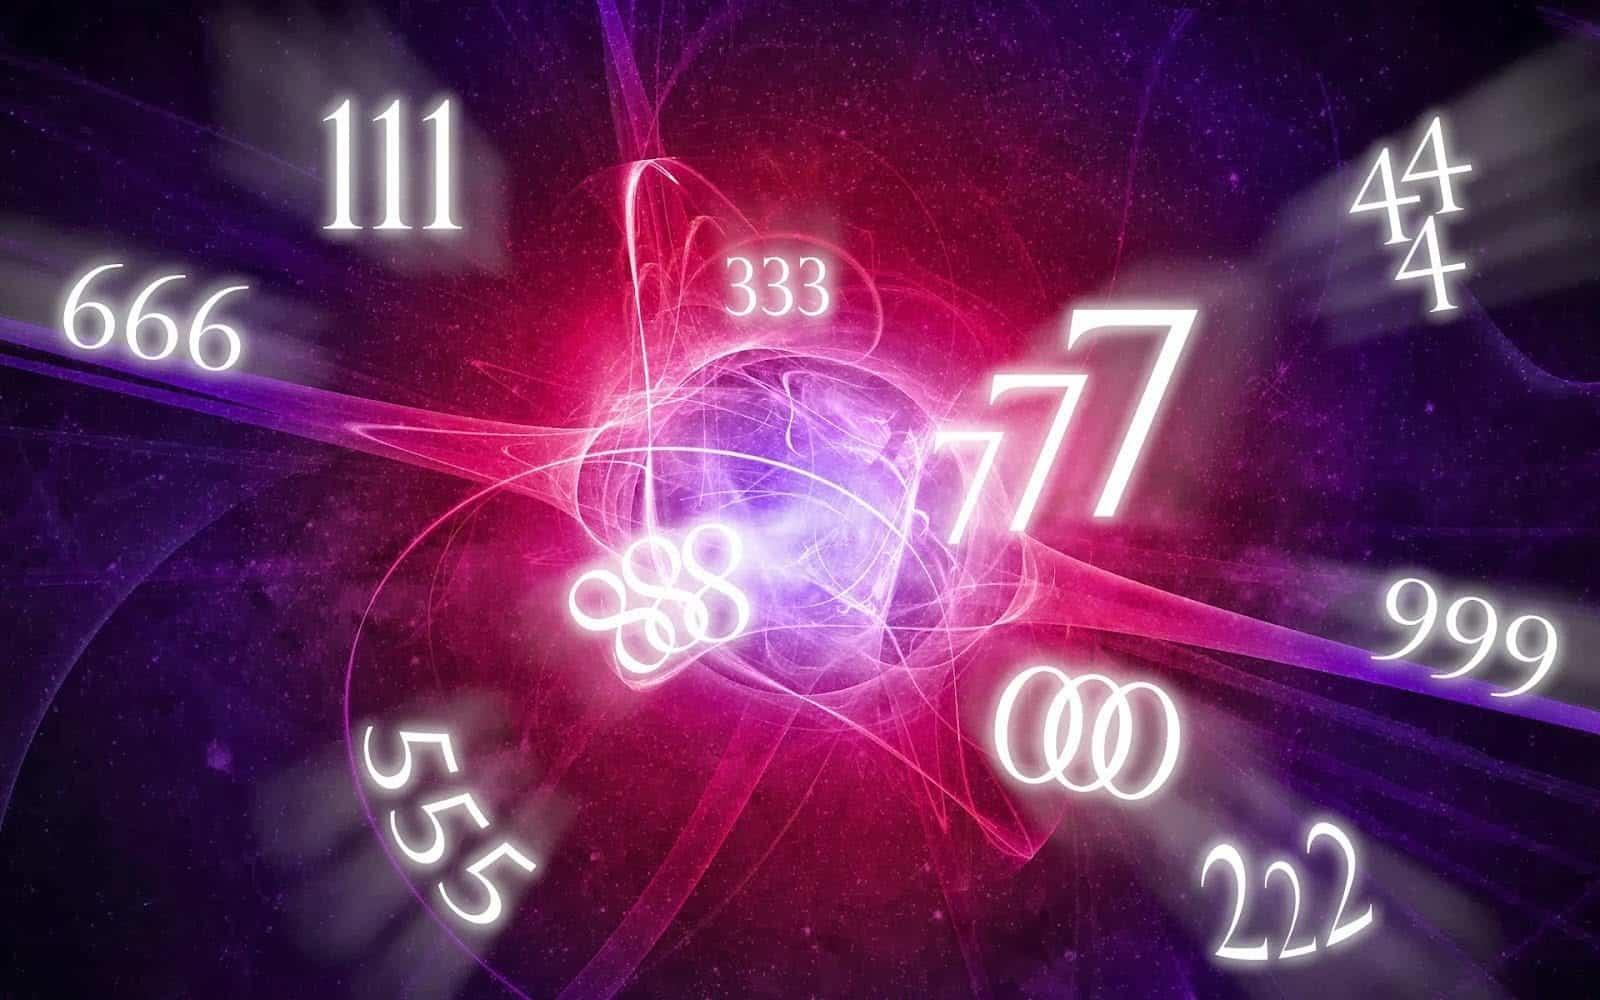 numeros espirituales o maestros importantes ¿cuáles son los números espirituales o maestros y qué poderes pose ID208889 - hermandadblanca.org